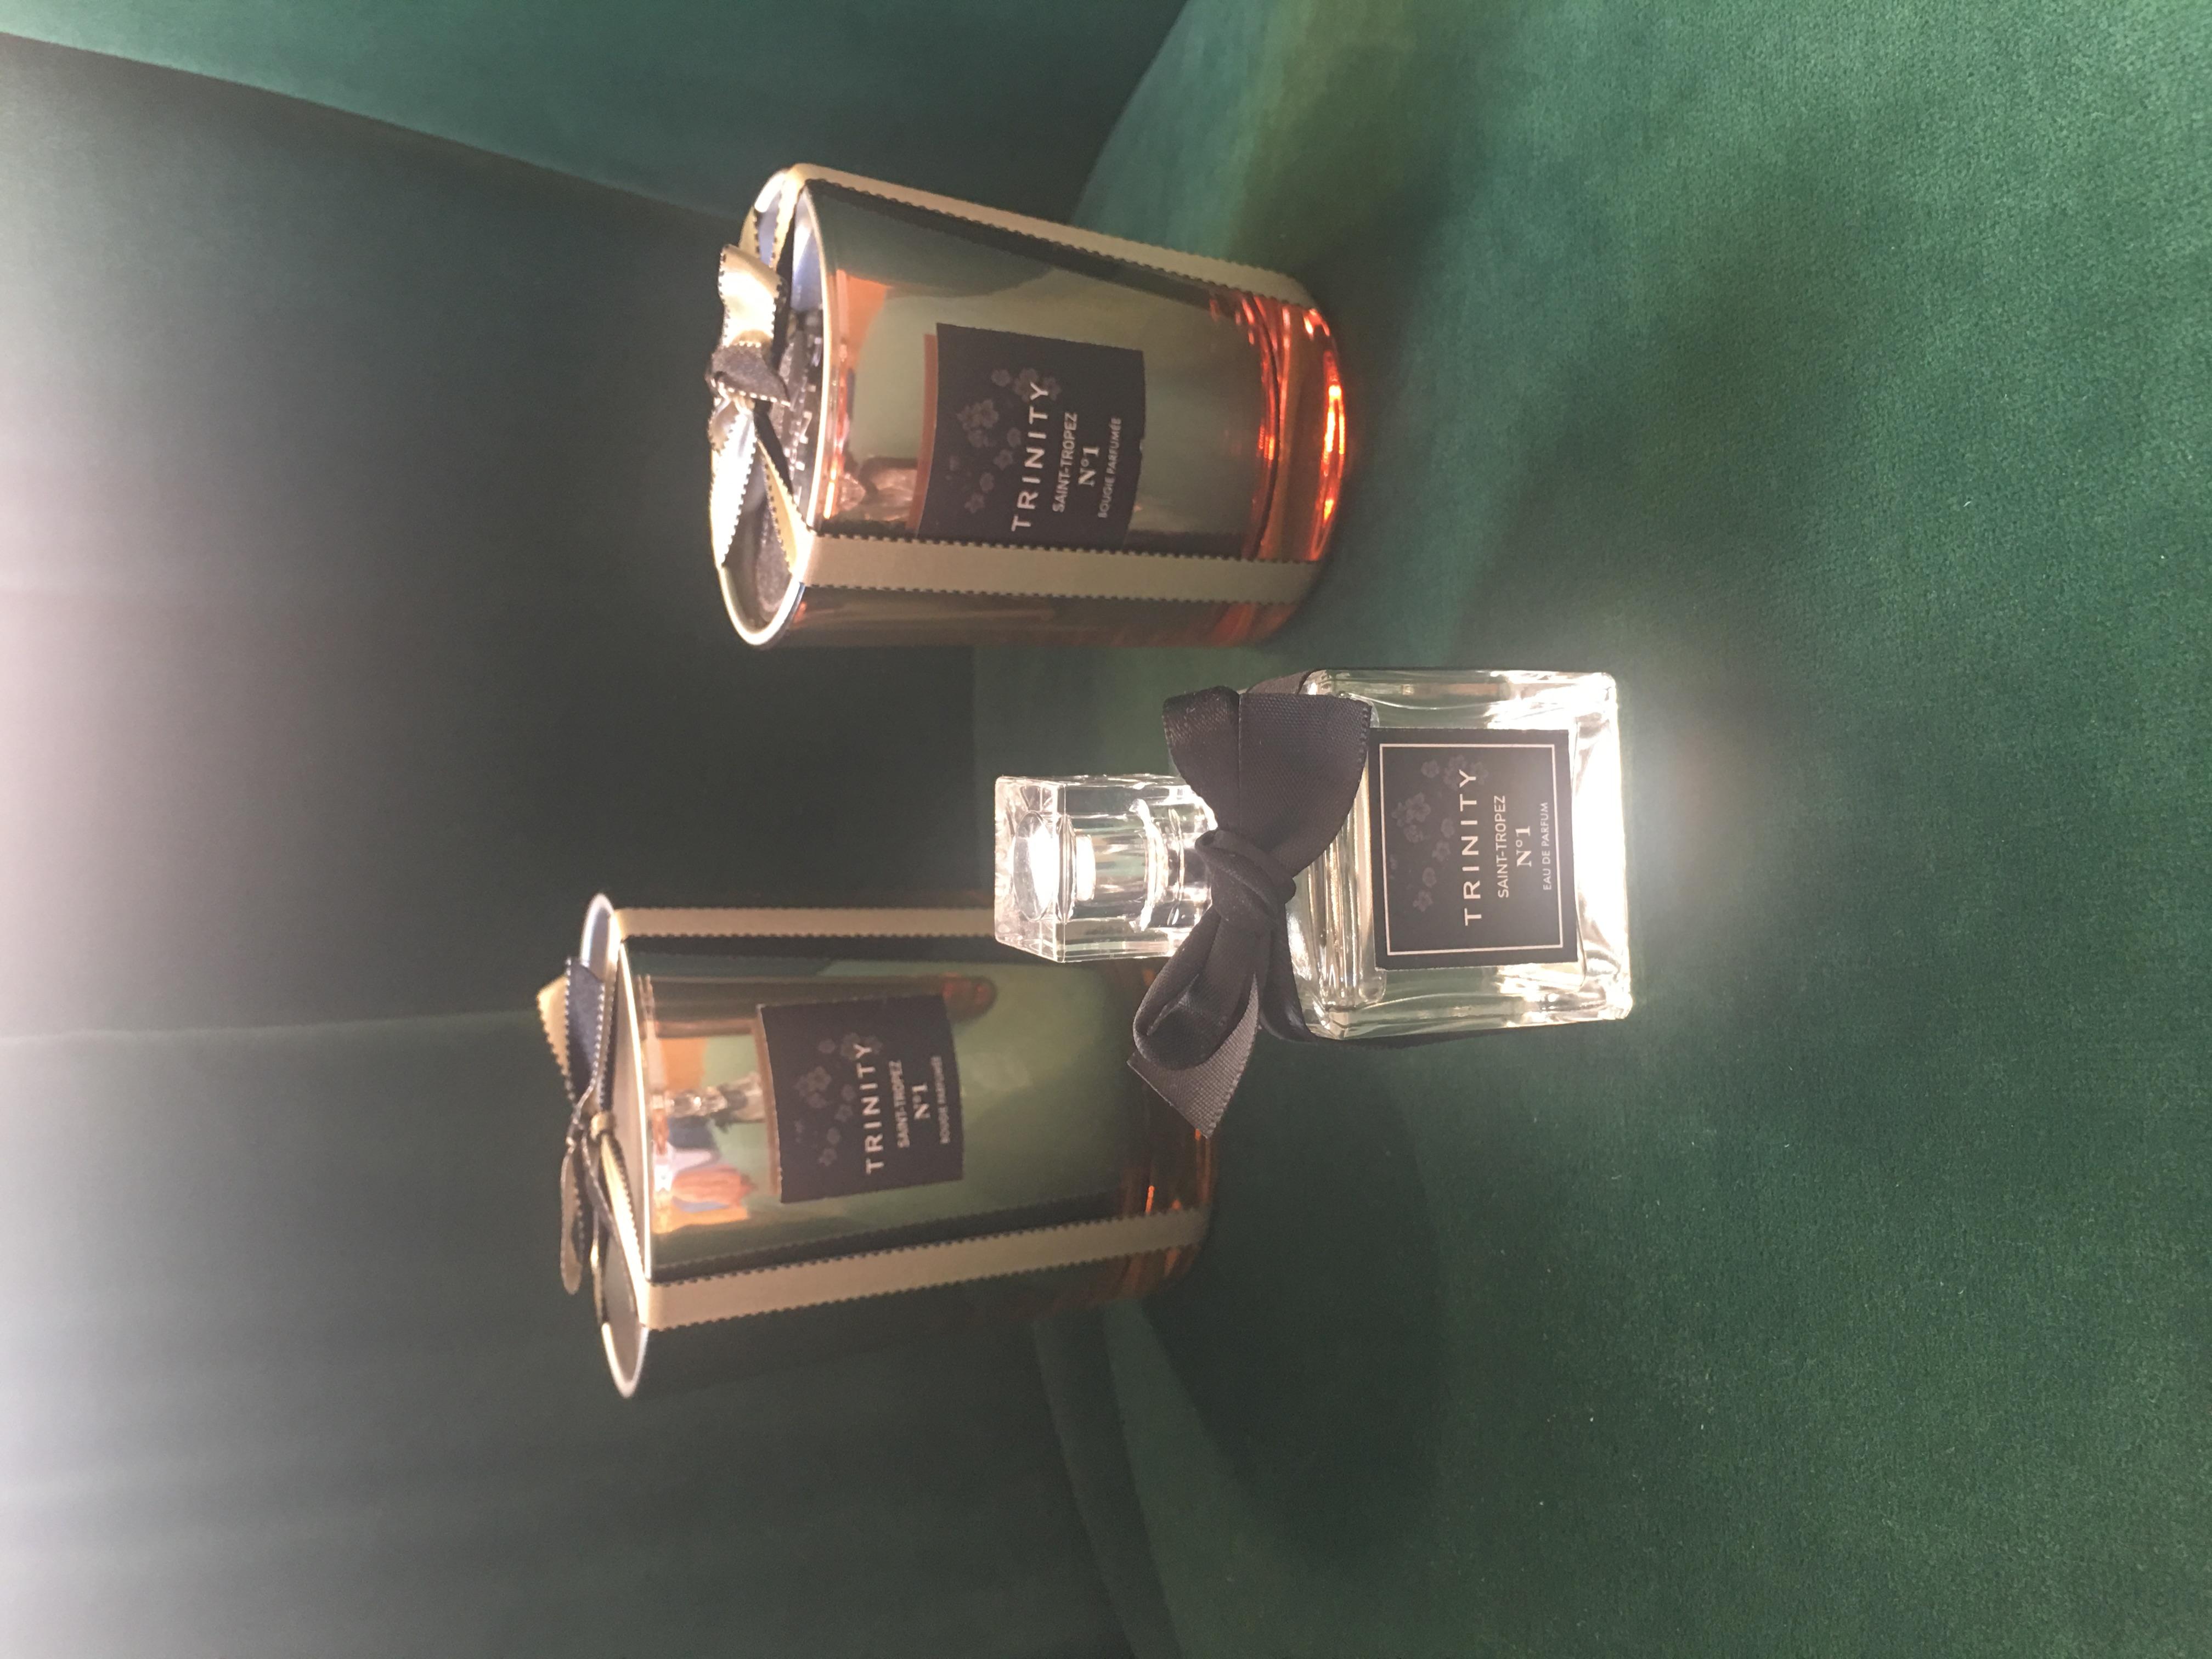 Bougies trinity saint-tropez et parfums trinity saint-tropez n°1 et n°2